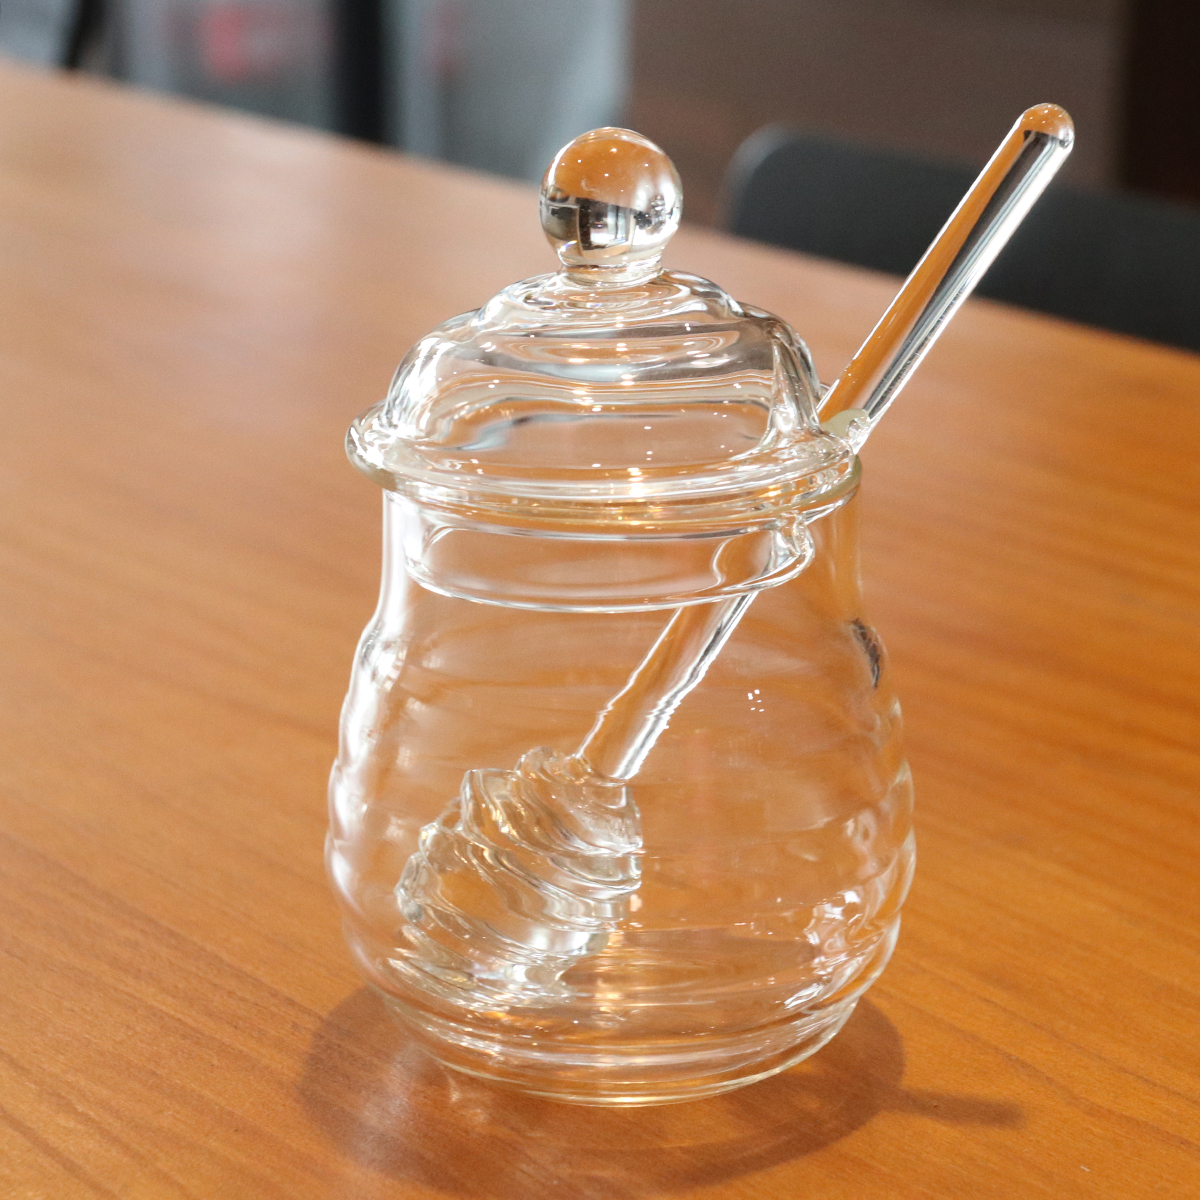 - Chutney Honey Candles 1lb Red Spotty 63mm lids Orcio Glass Jam Jars 370ml